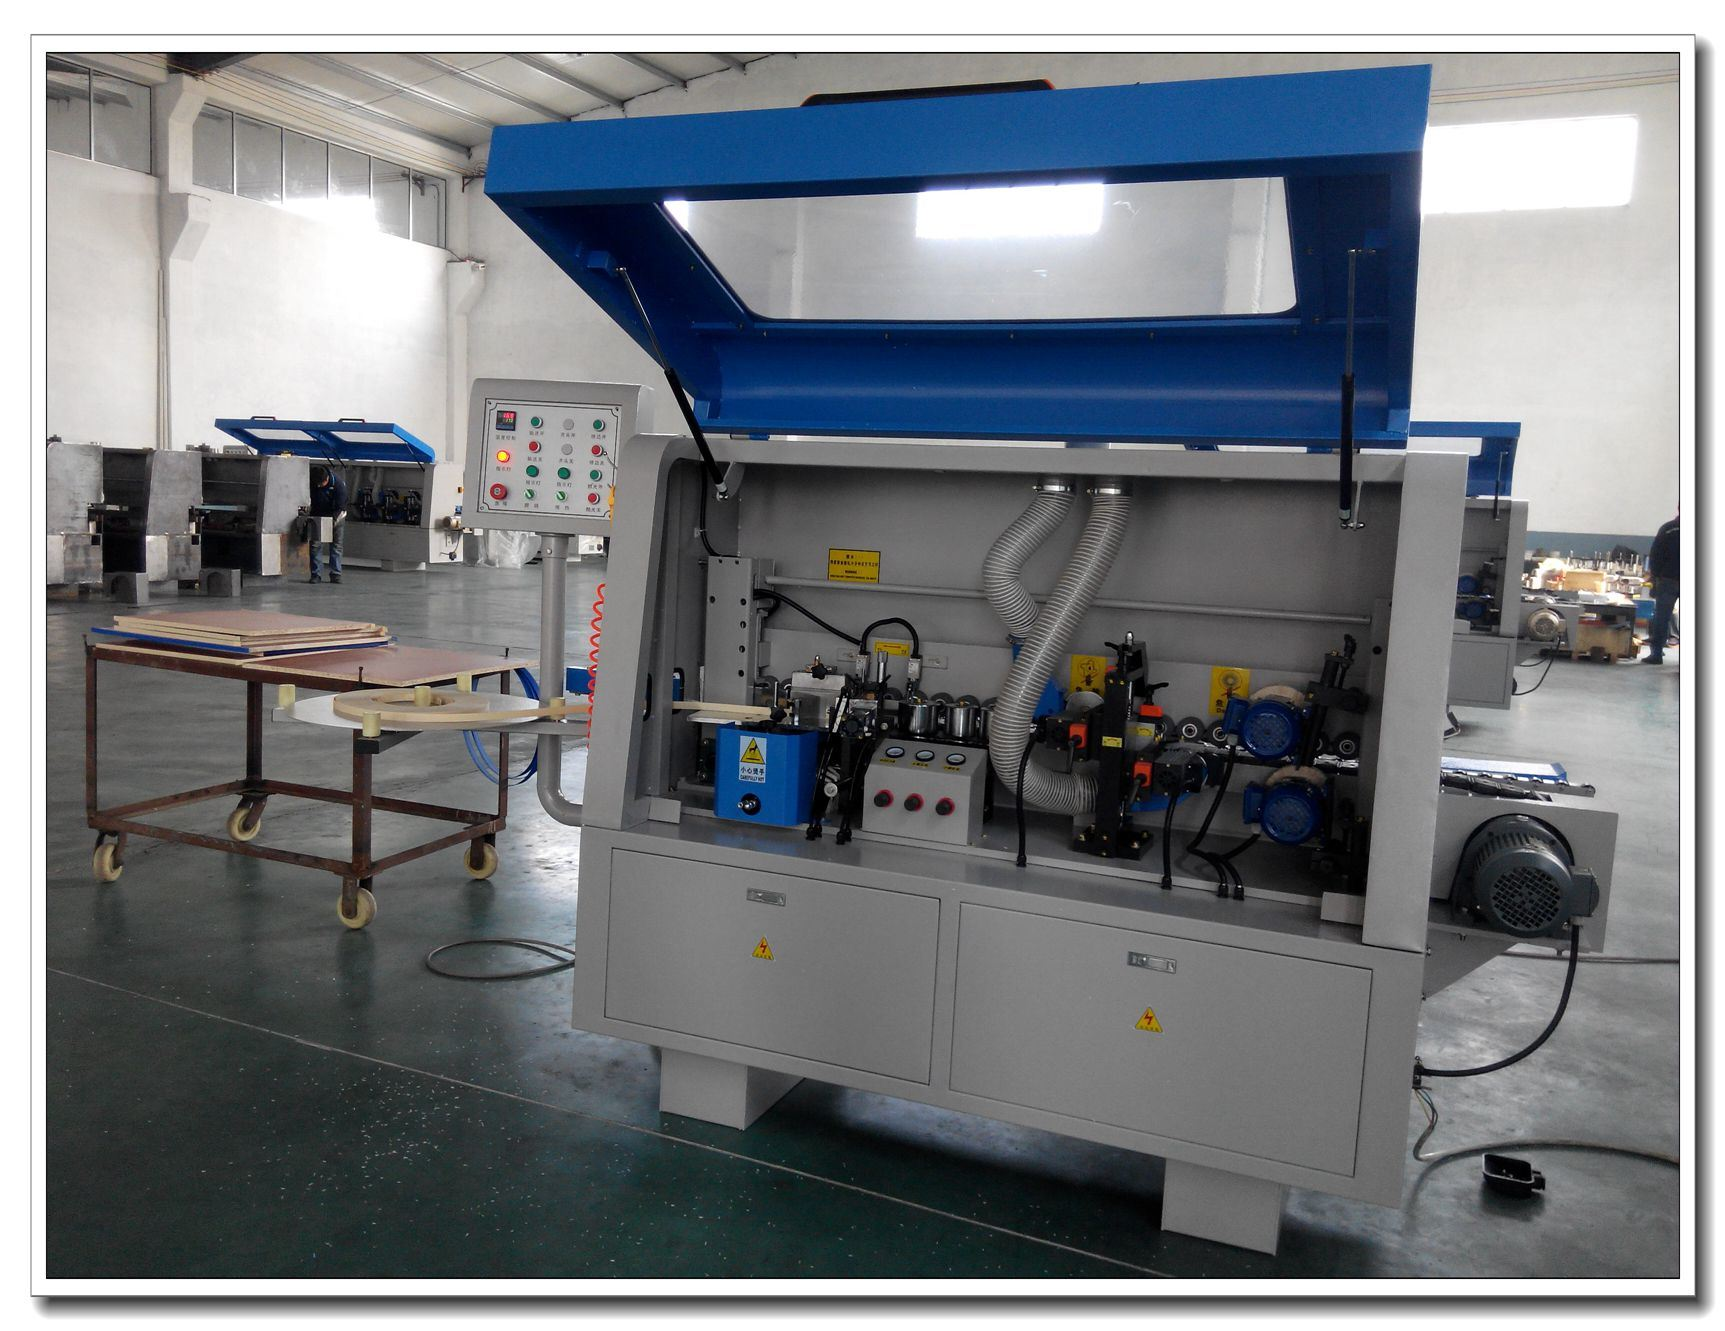 PVC Edge Banding Machine for Sealing MDF Edge Bander Mf60e